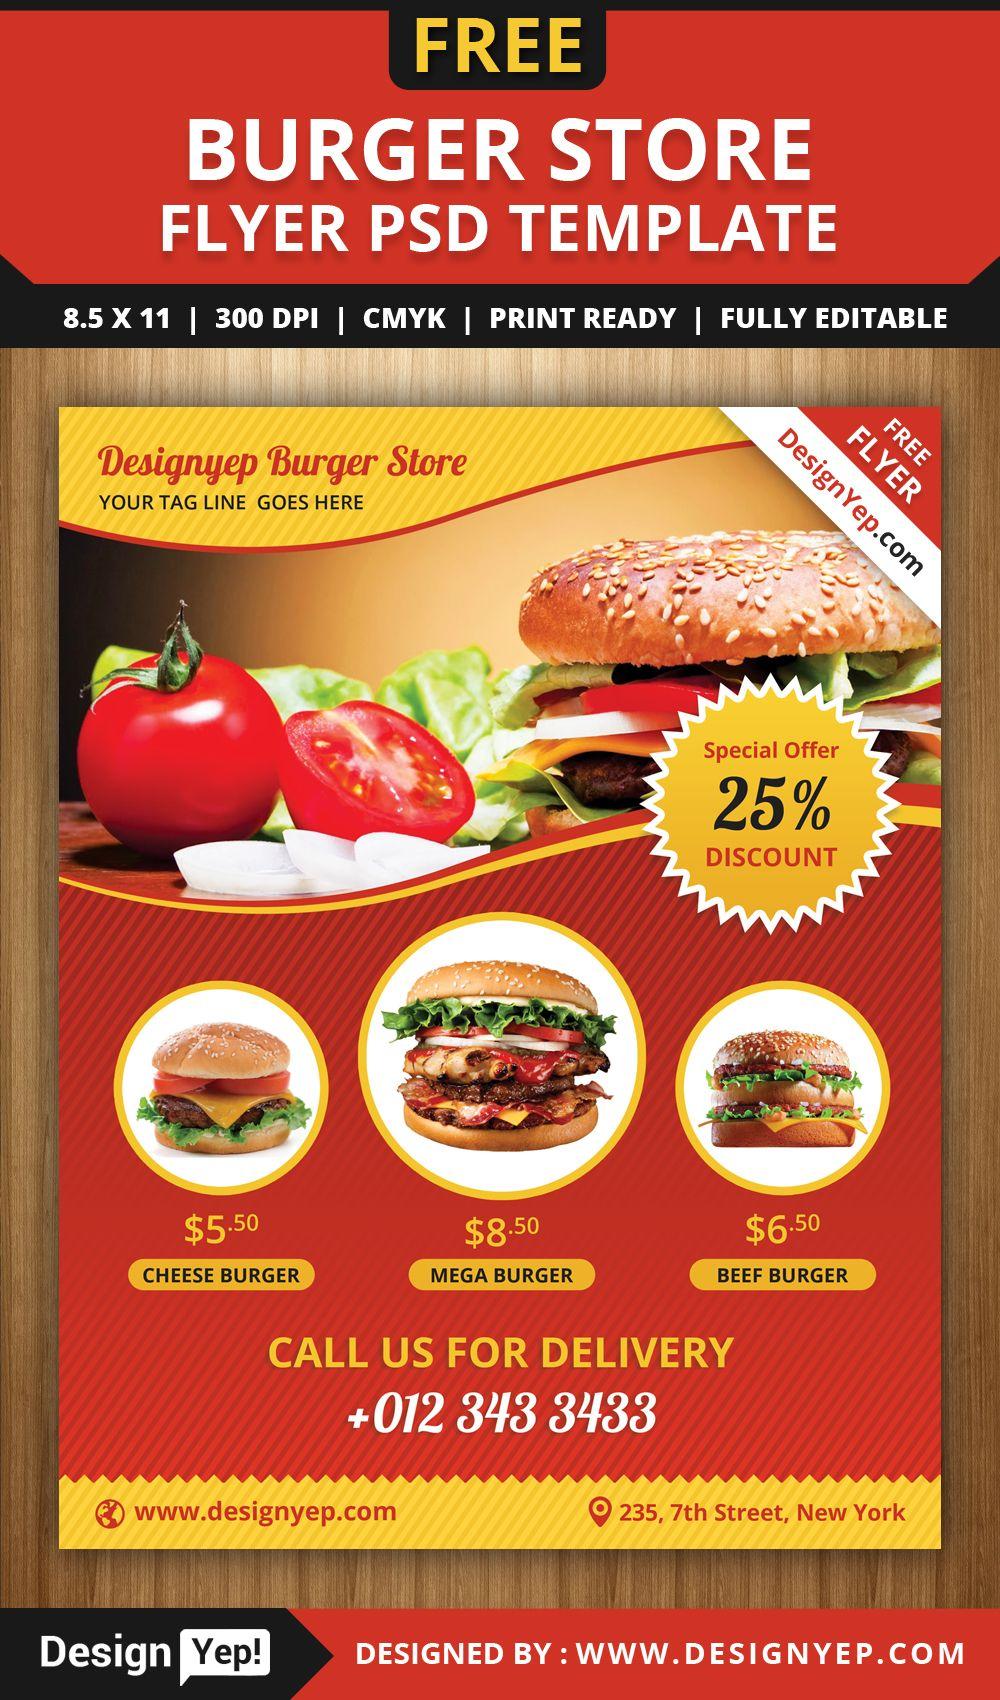 free burger store flyer psd template 1988 desingyep free flyers